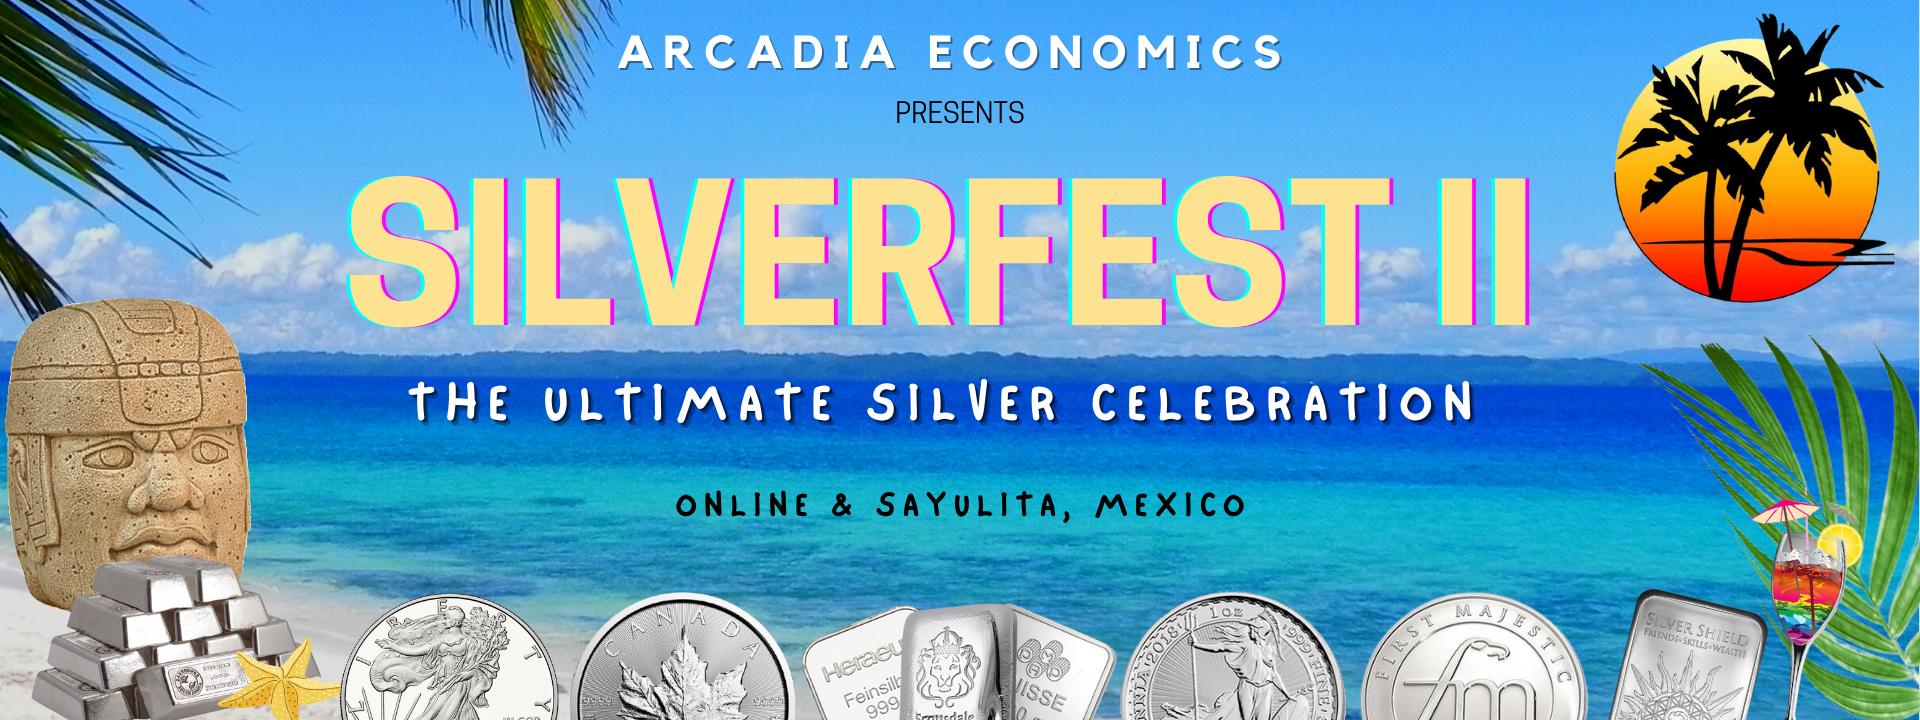 Arcadia Economics Silverfest 2